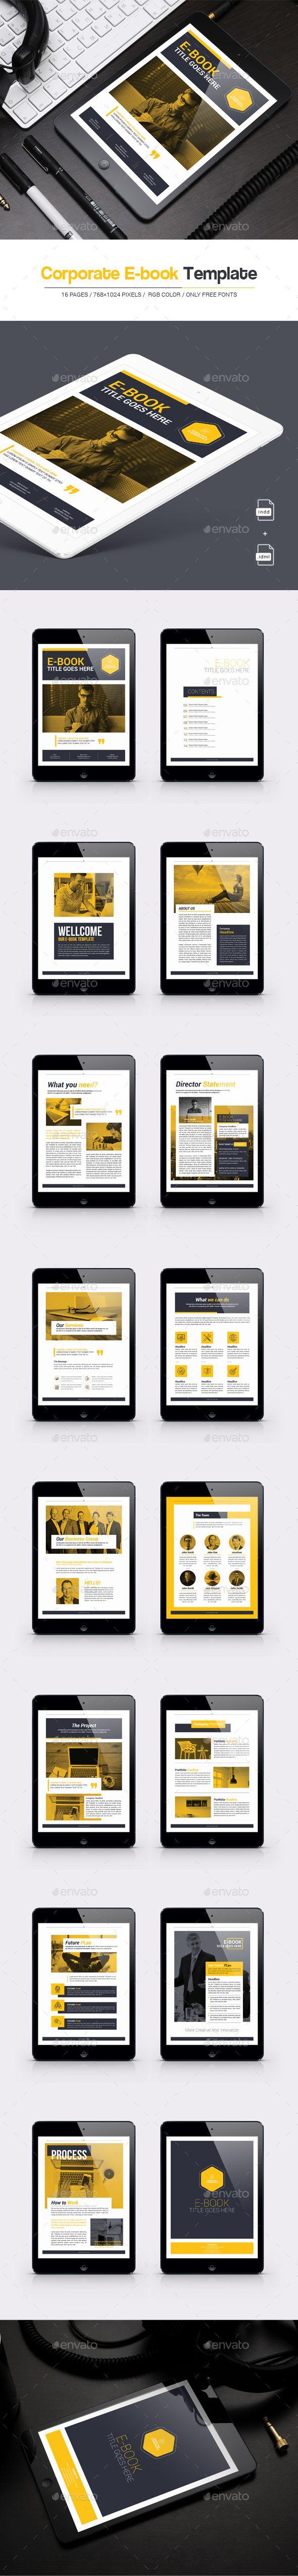 Corporate E Book Digital Books Epublishing Download Here Https Graphicriver Net Item Corporate Ebook 19694346 Ref Alena994 E Book Ebook Template Books